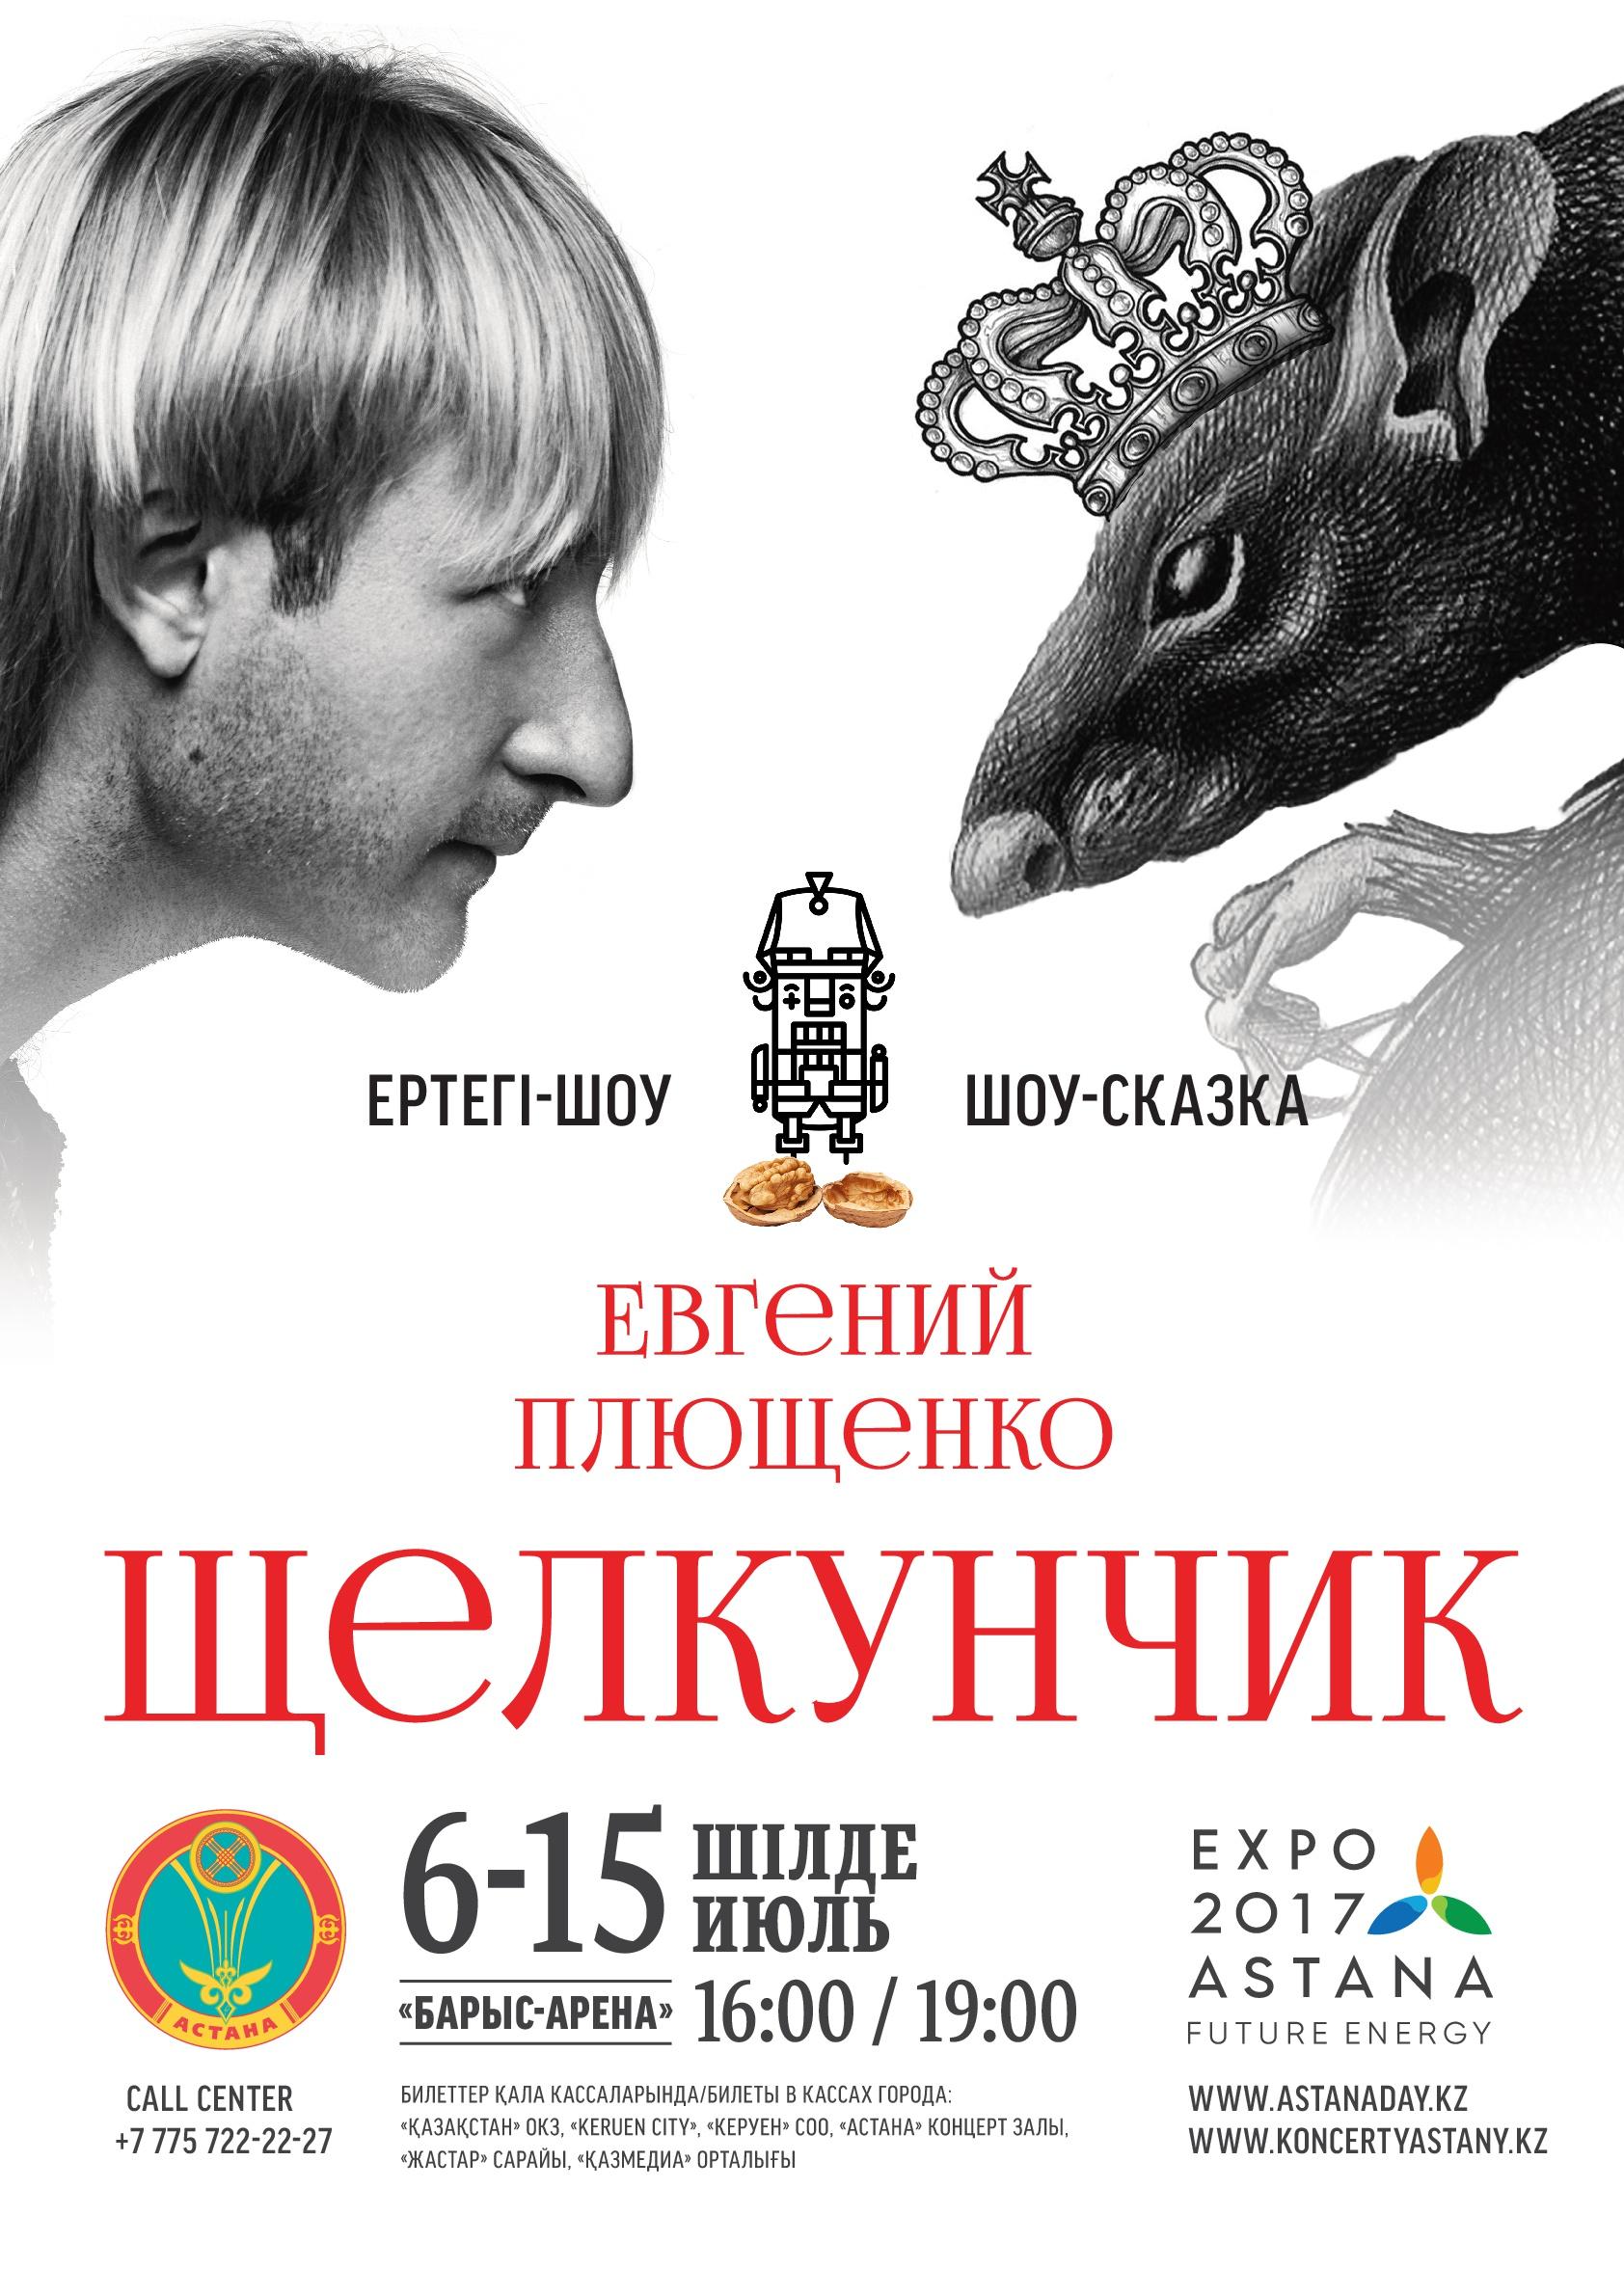 "Ертегі-шоу ""Щелкунчик"" Шоу-Сказка"